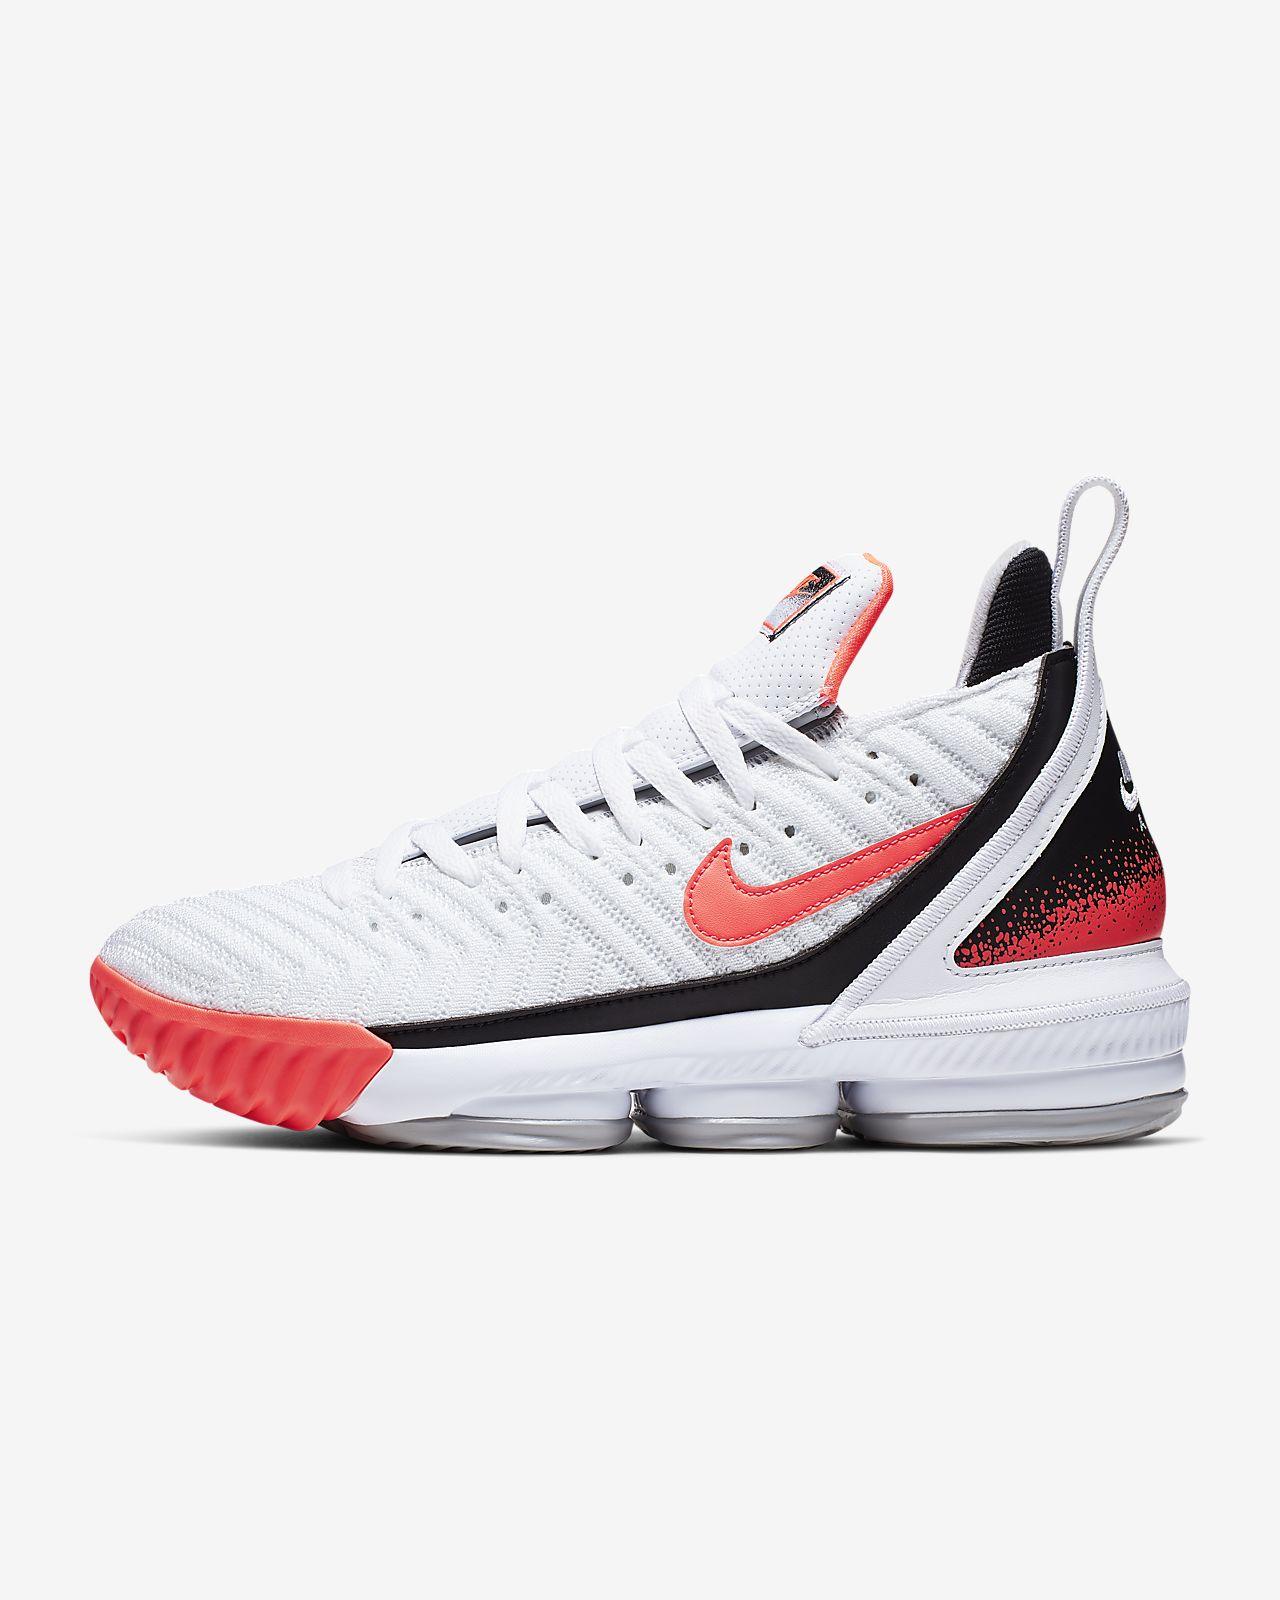 Buty do koszykówki LeBron XVI Hot Lava White